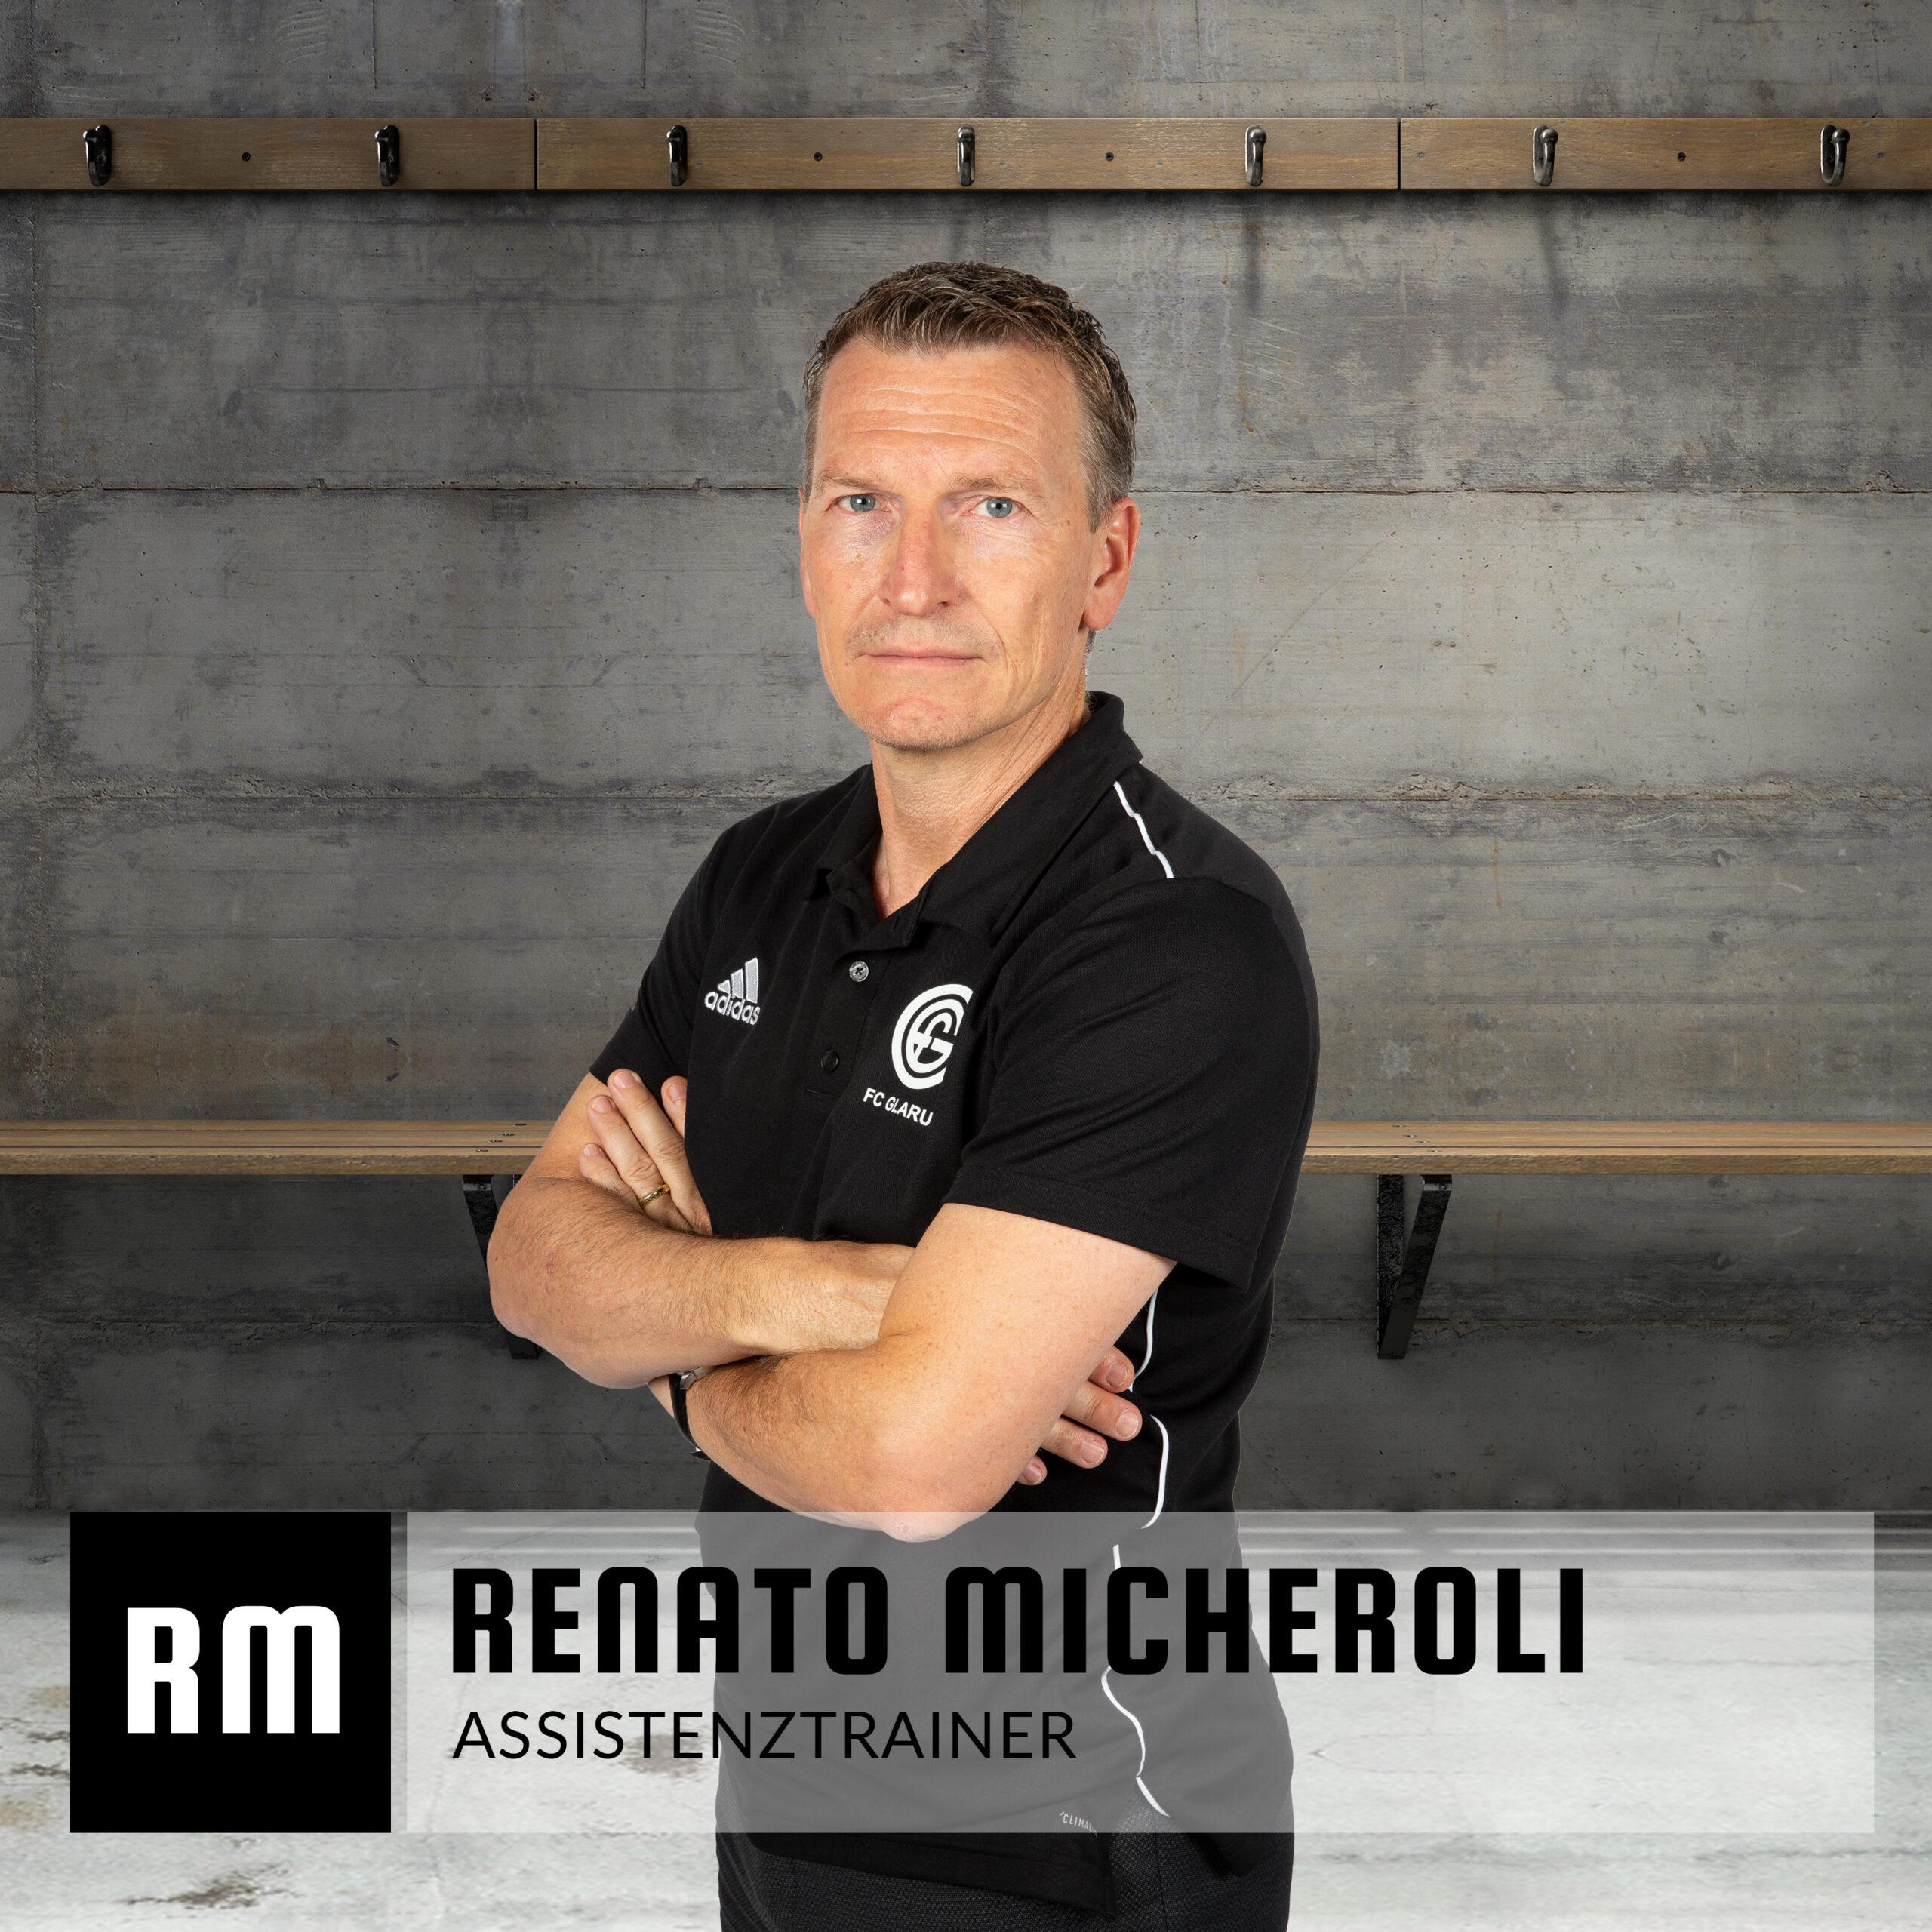 Renato Micheroli